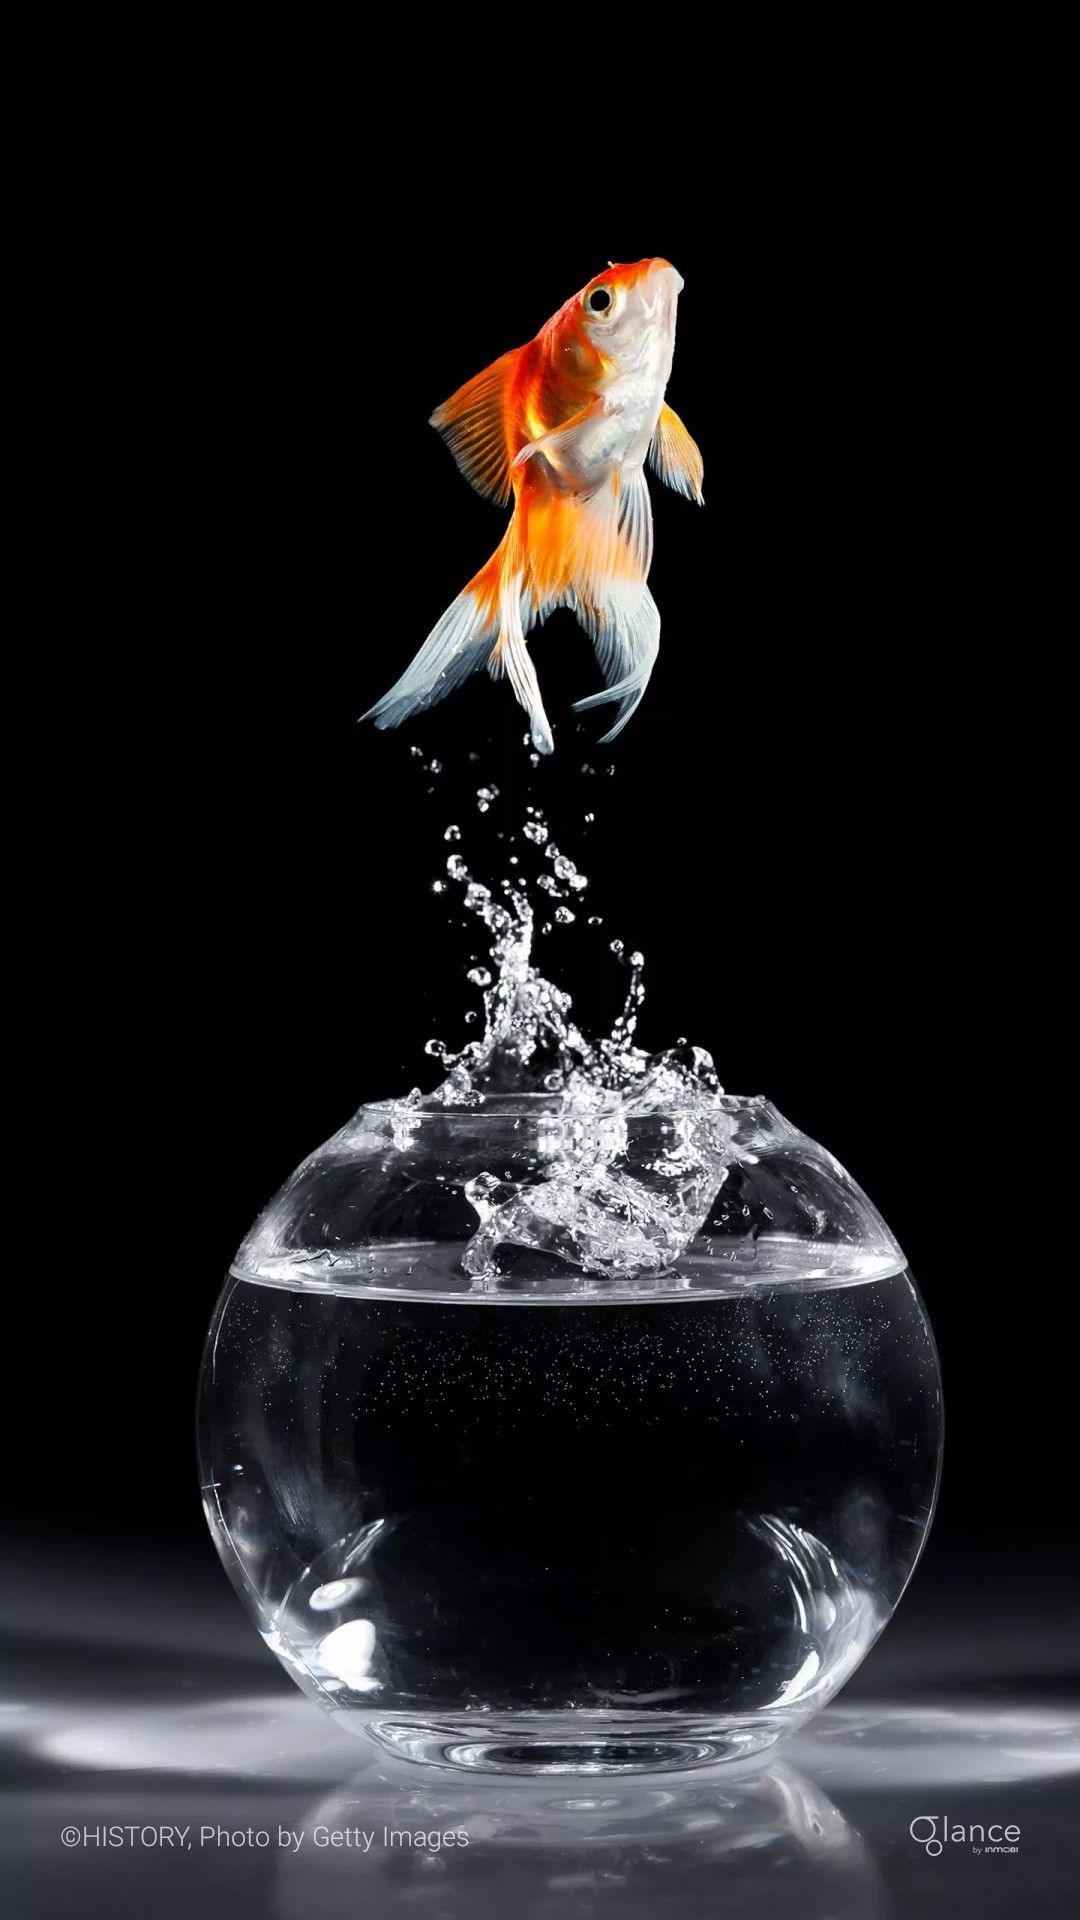 Pin By Faheem On Photography Fish Wallpaper Fish Art Watercolour Inspiration